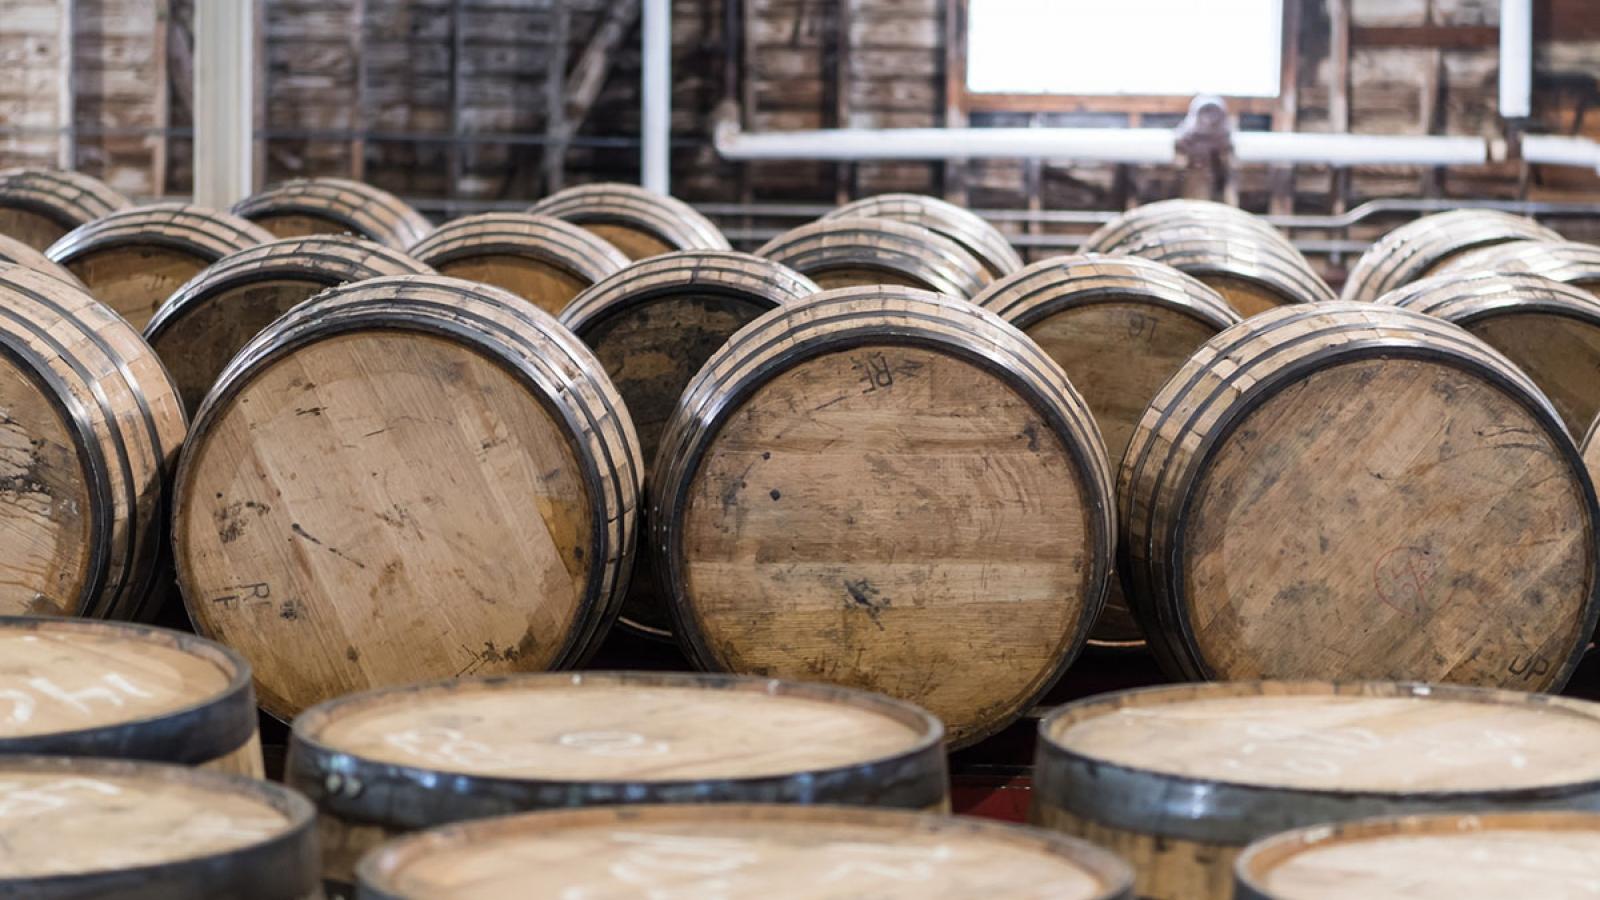 bourbon barrels inside a rickhouse